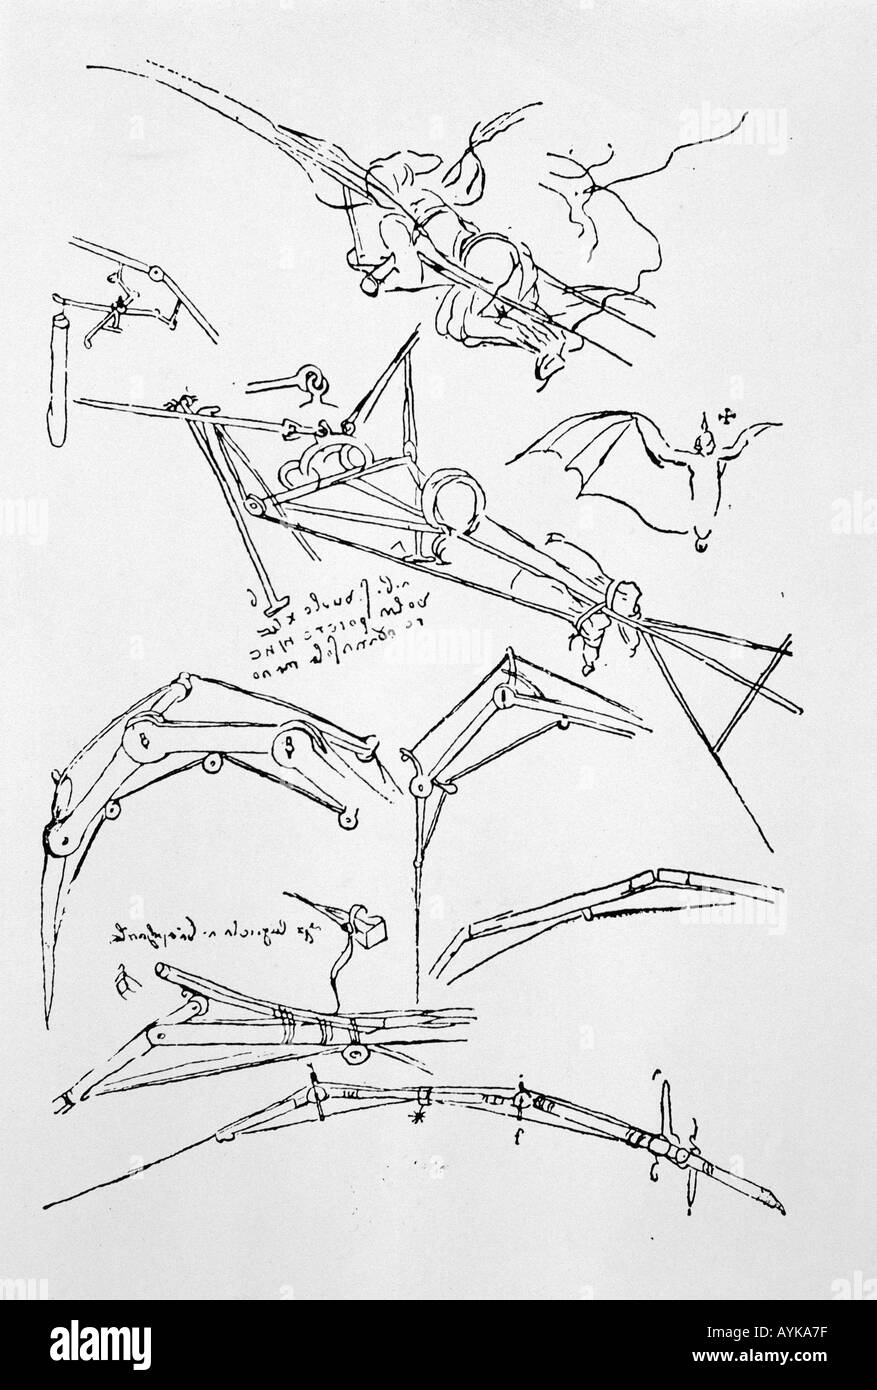 Leonardo bocetos Imagen De Stock